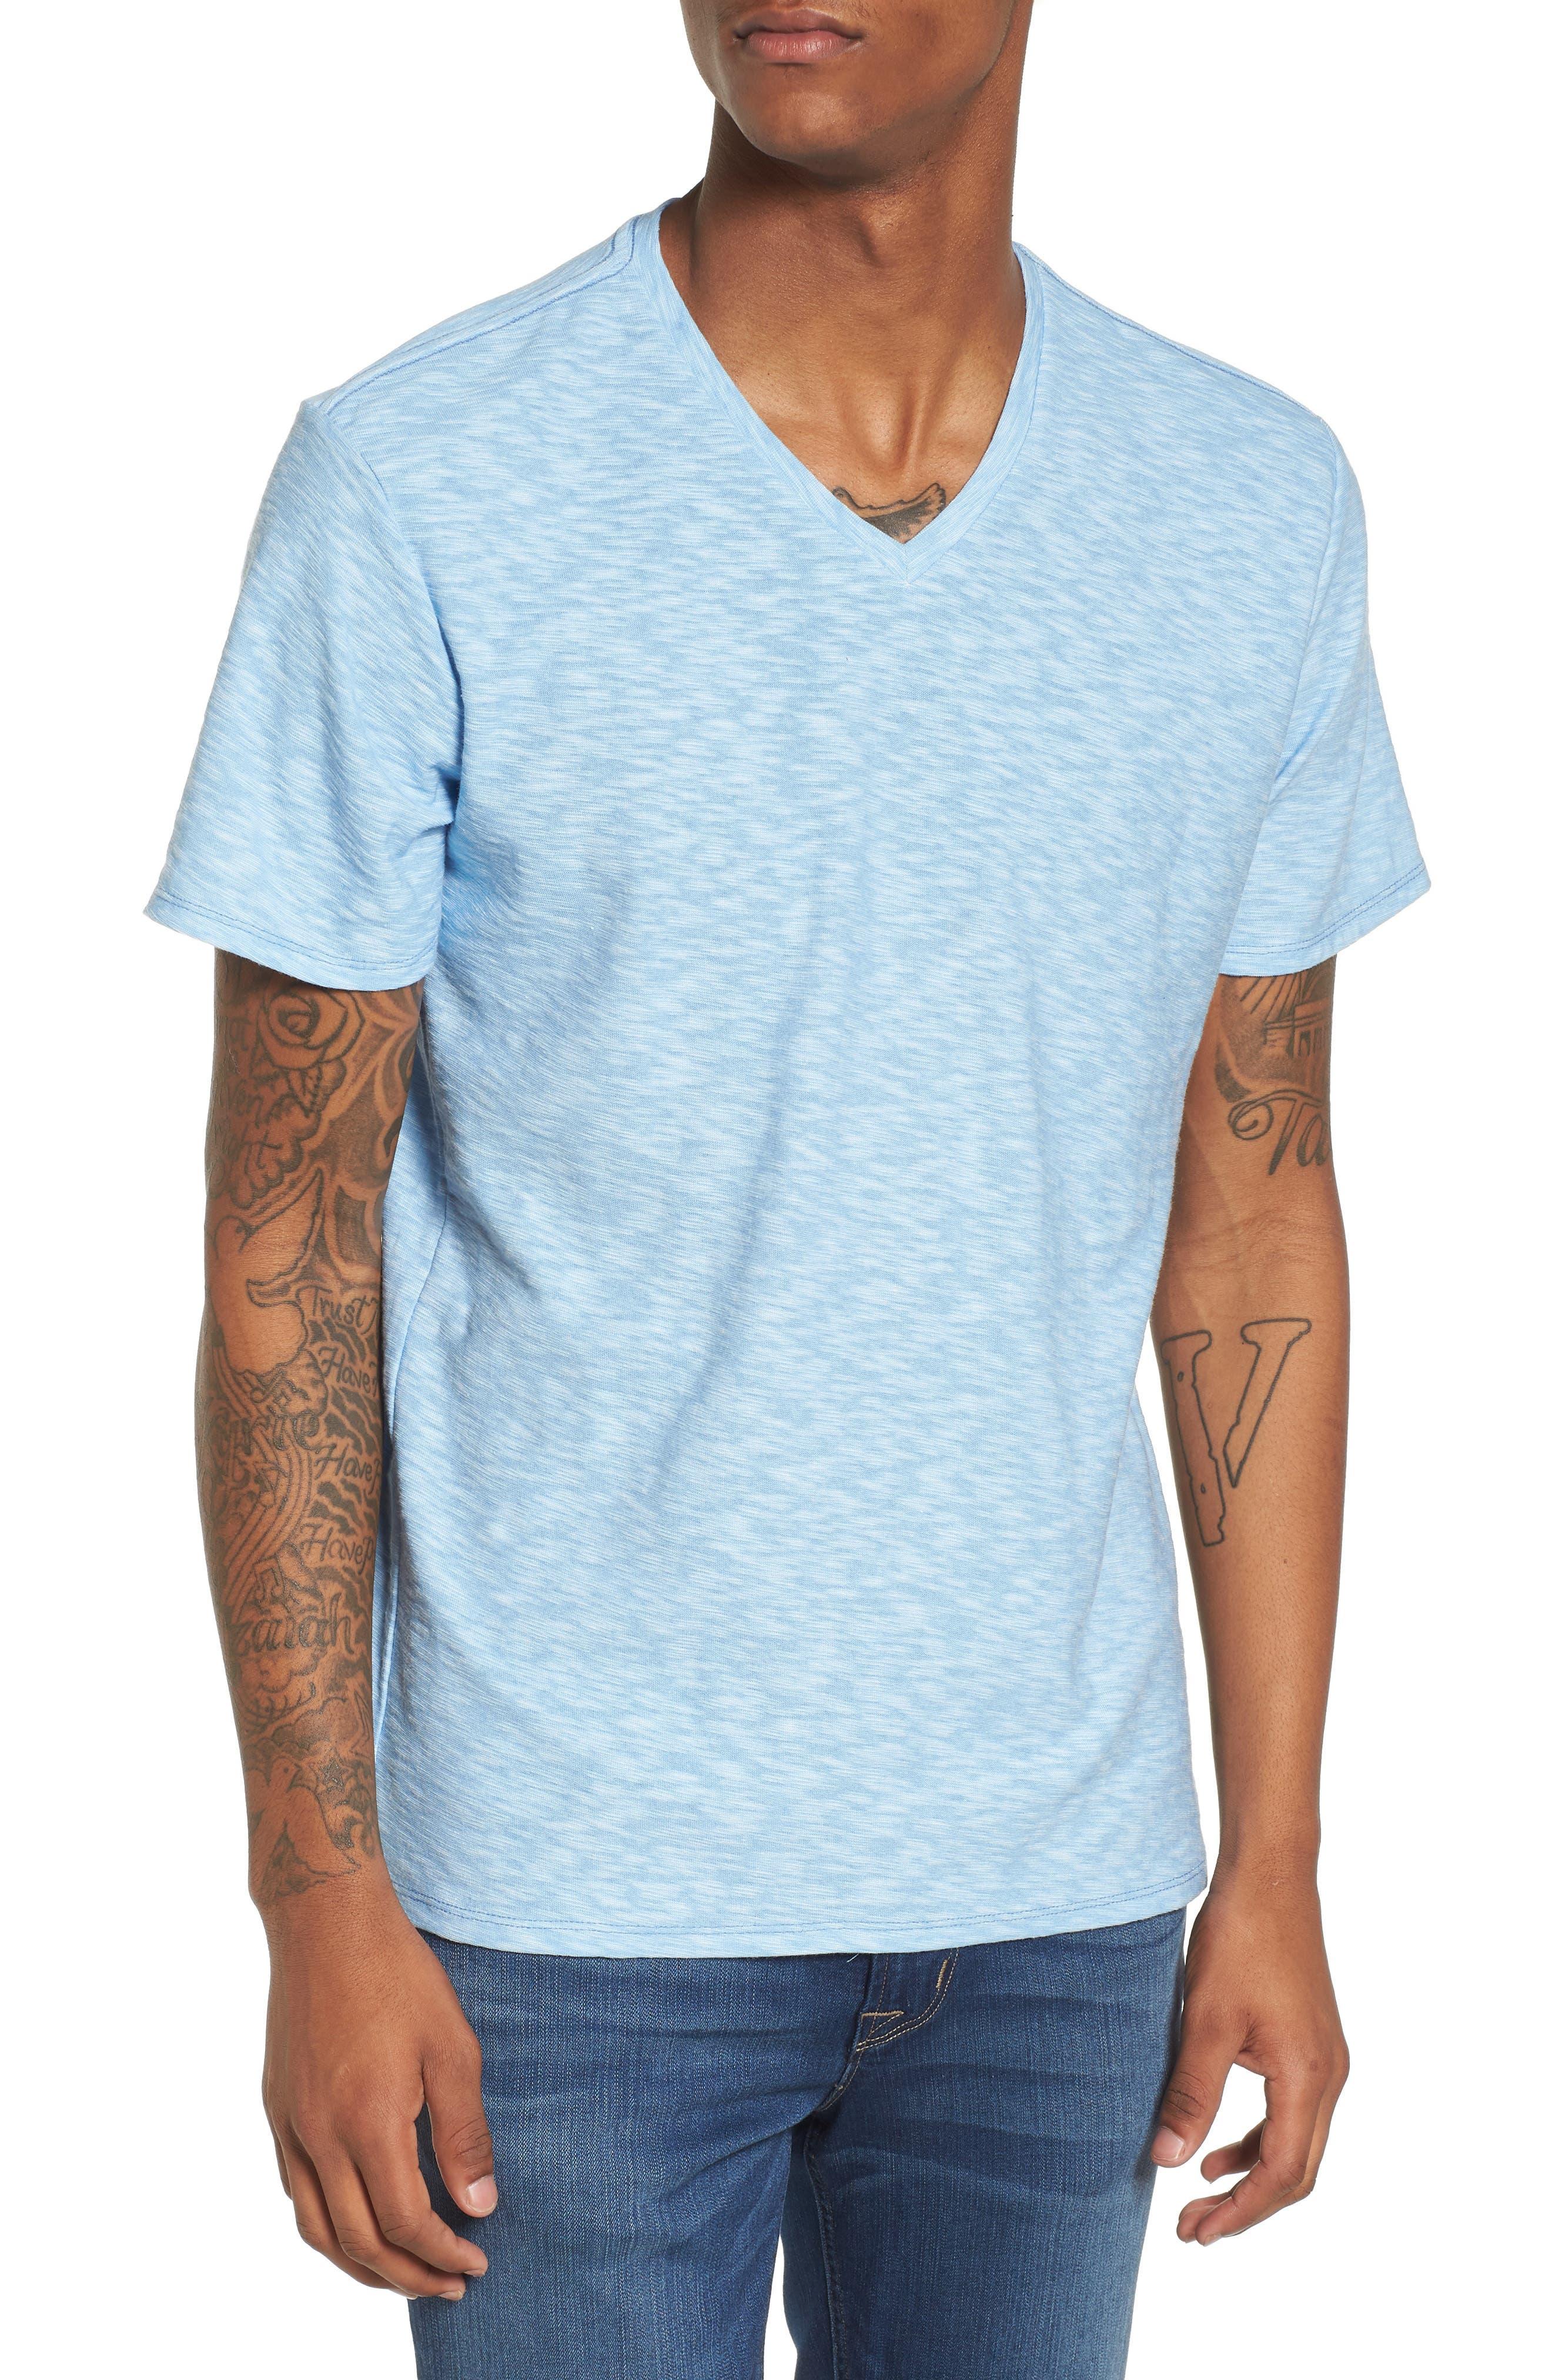 The Rail Slub Knit V-Neck T-Shirt